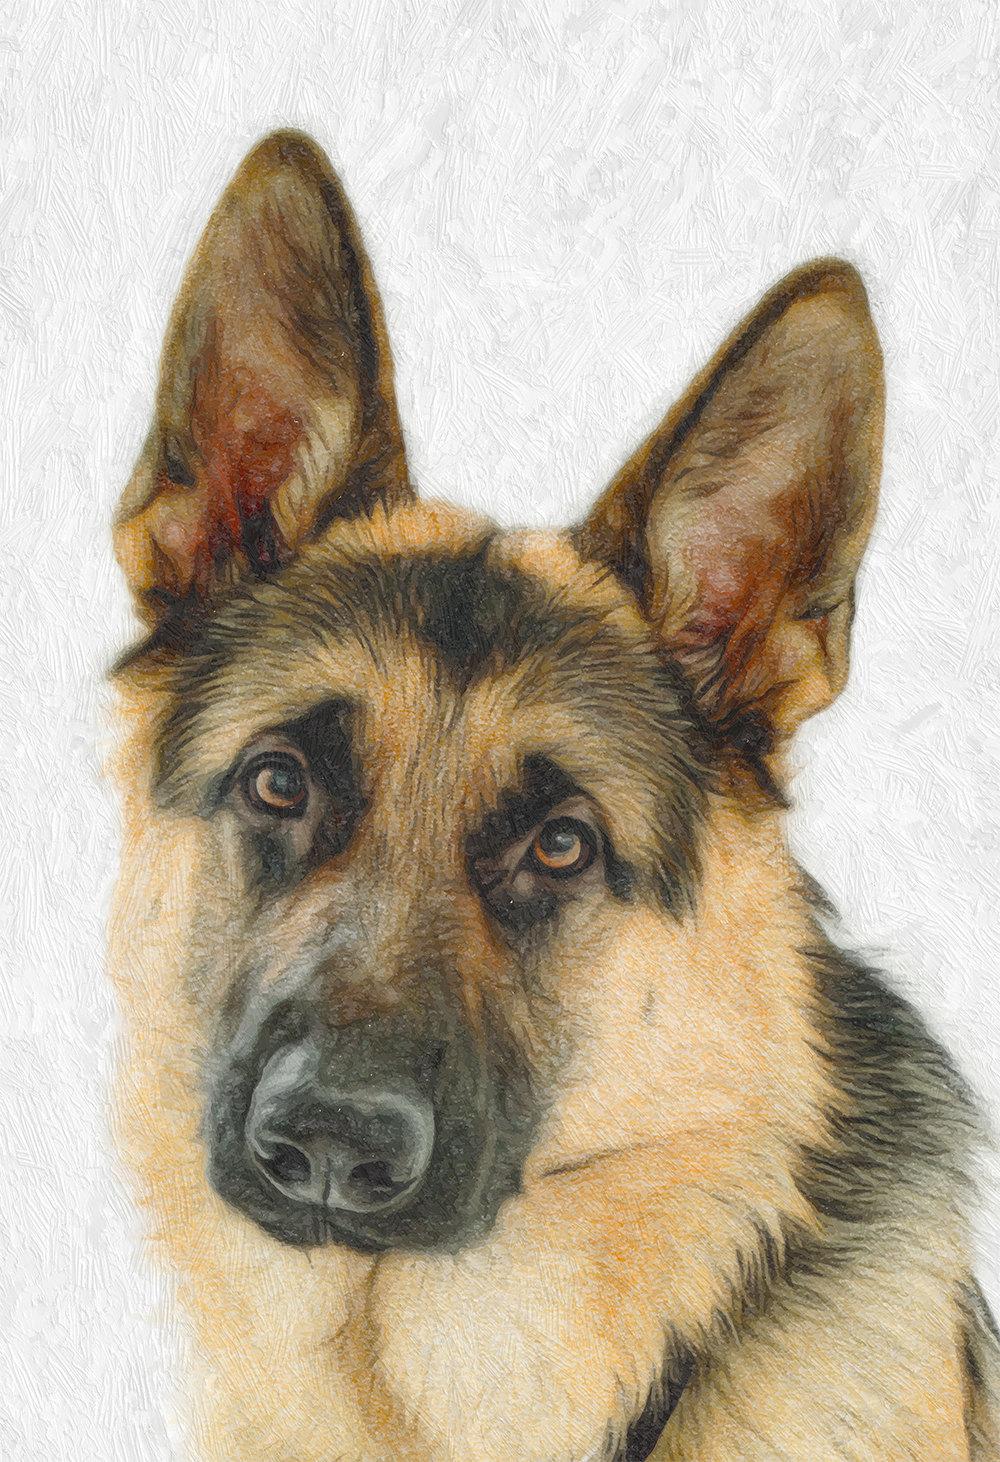 German Shepherd Dog Print Illustration Art Print Poster Giclee On Cotton Canvas And Satin Photo Paper Welovecmyk